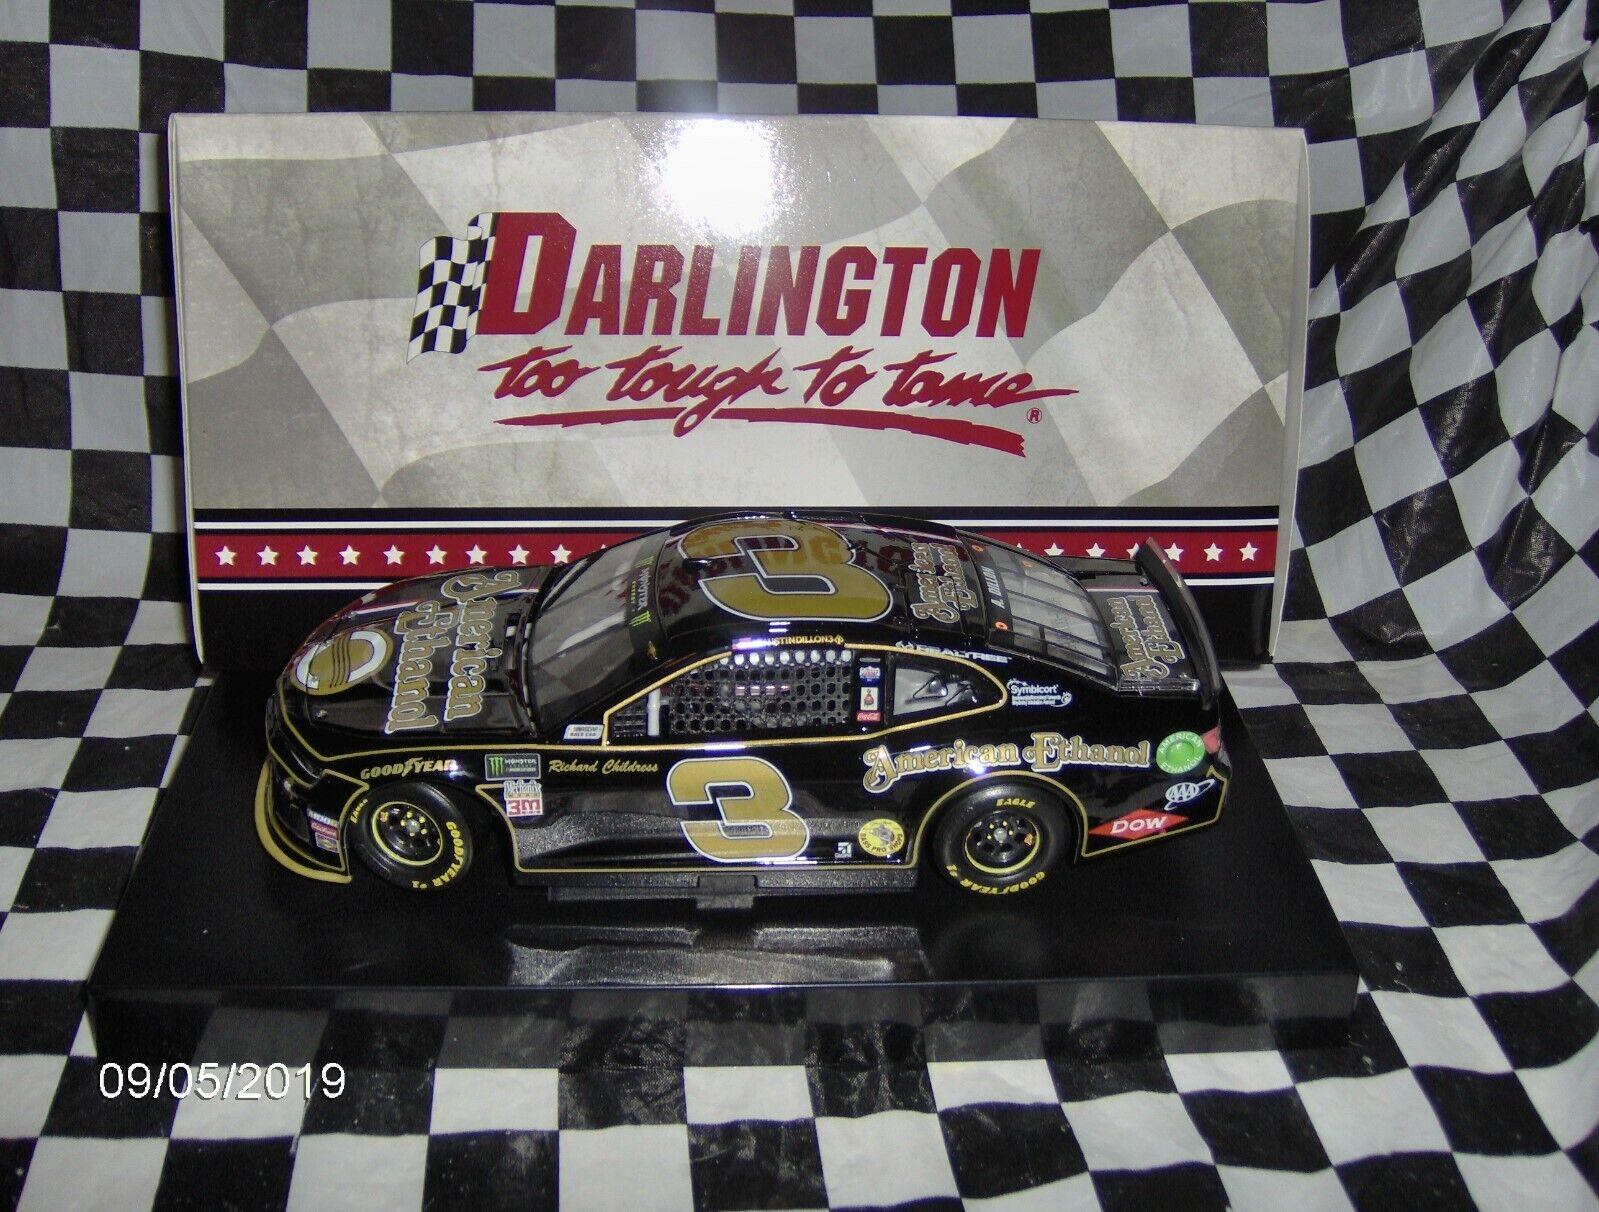 2019 Austin Dillon   3  American Ethanol Darlington 1 24th.